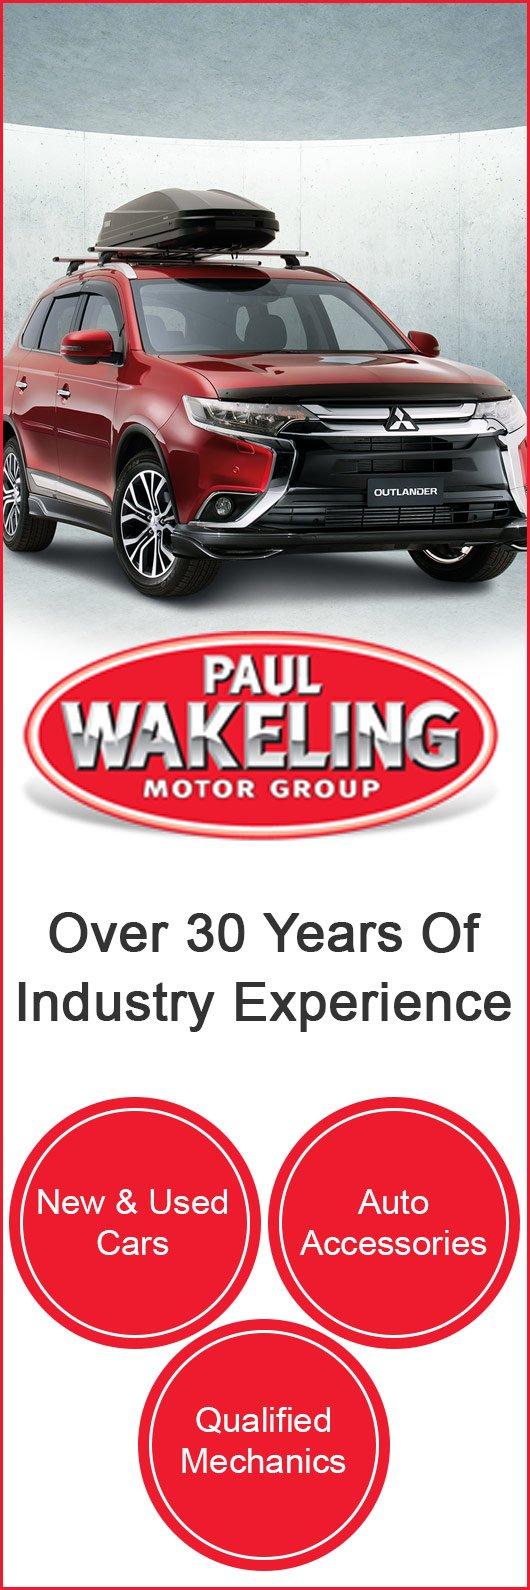 Paul Wakeling Motor Group 112